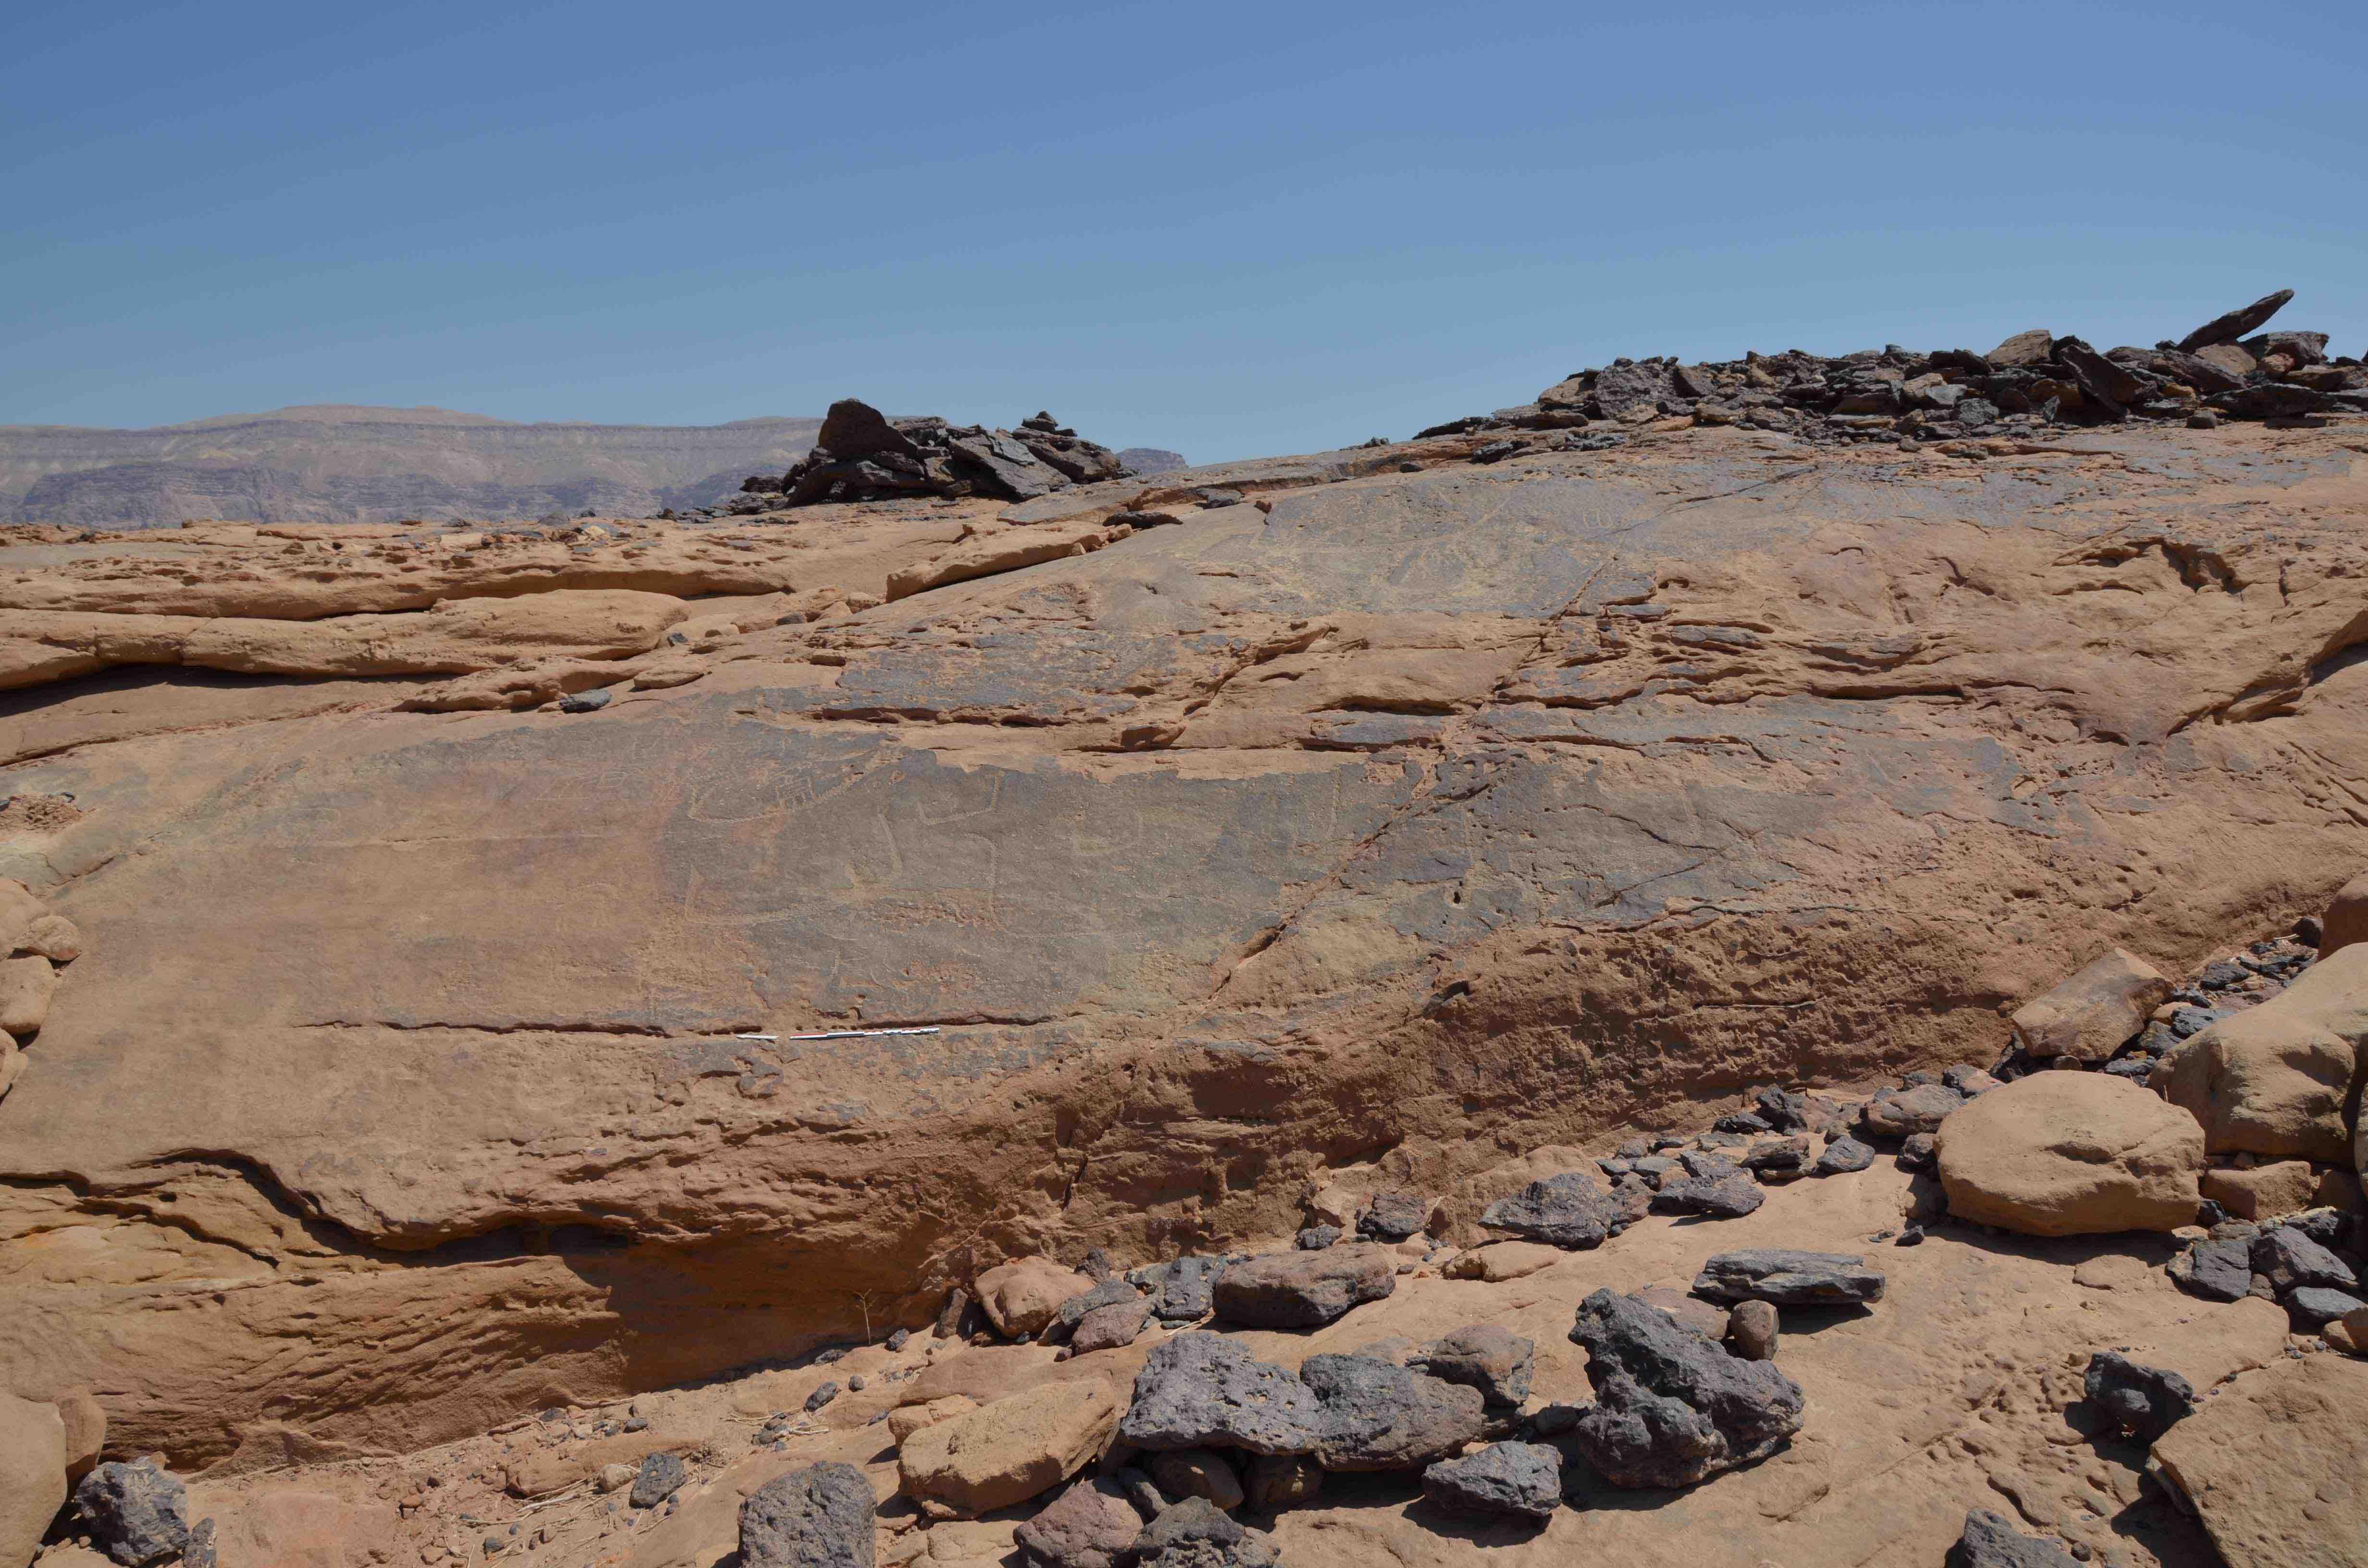 fig. Sinai 3-léger